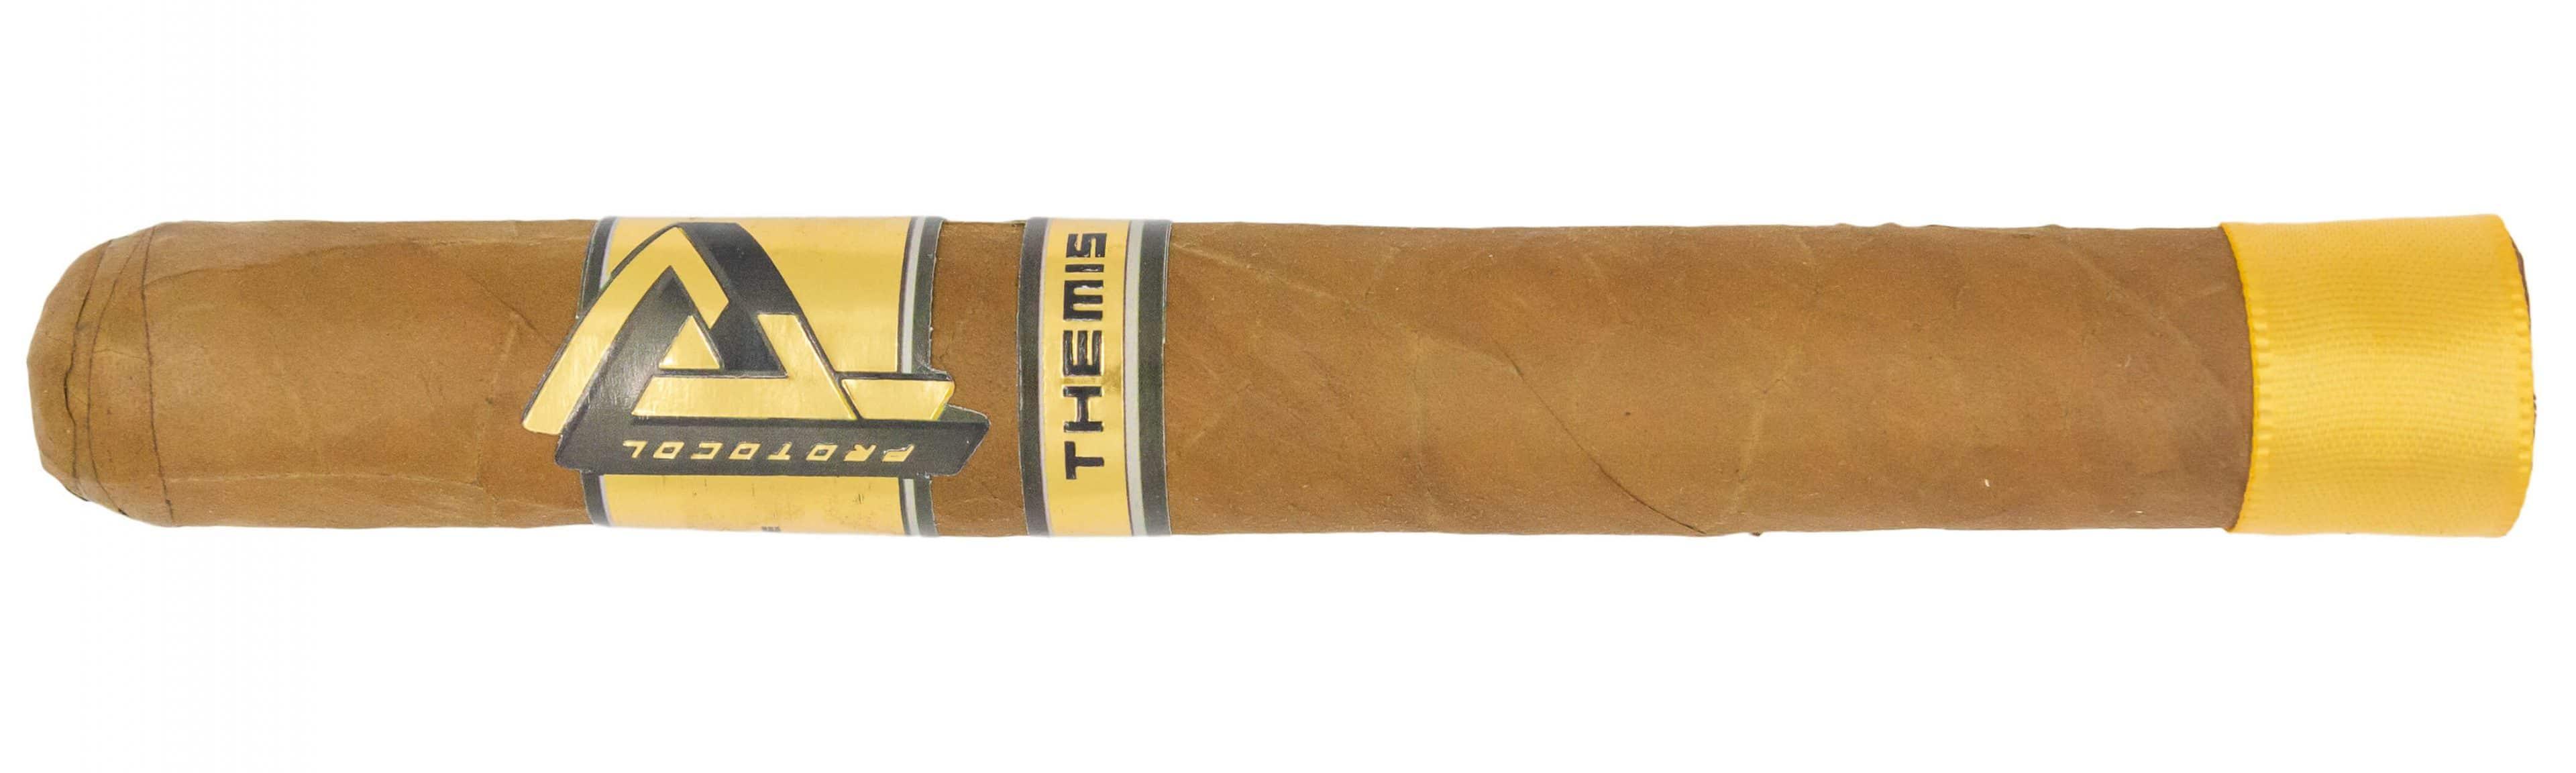 Blind Cigar Review: Cubariqueño | Protocol Themis Corona Gorda